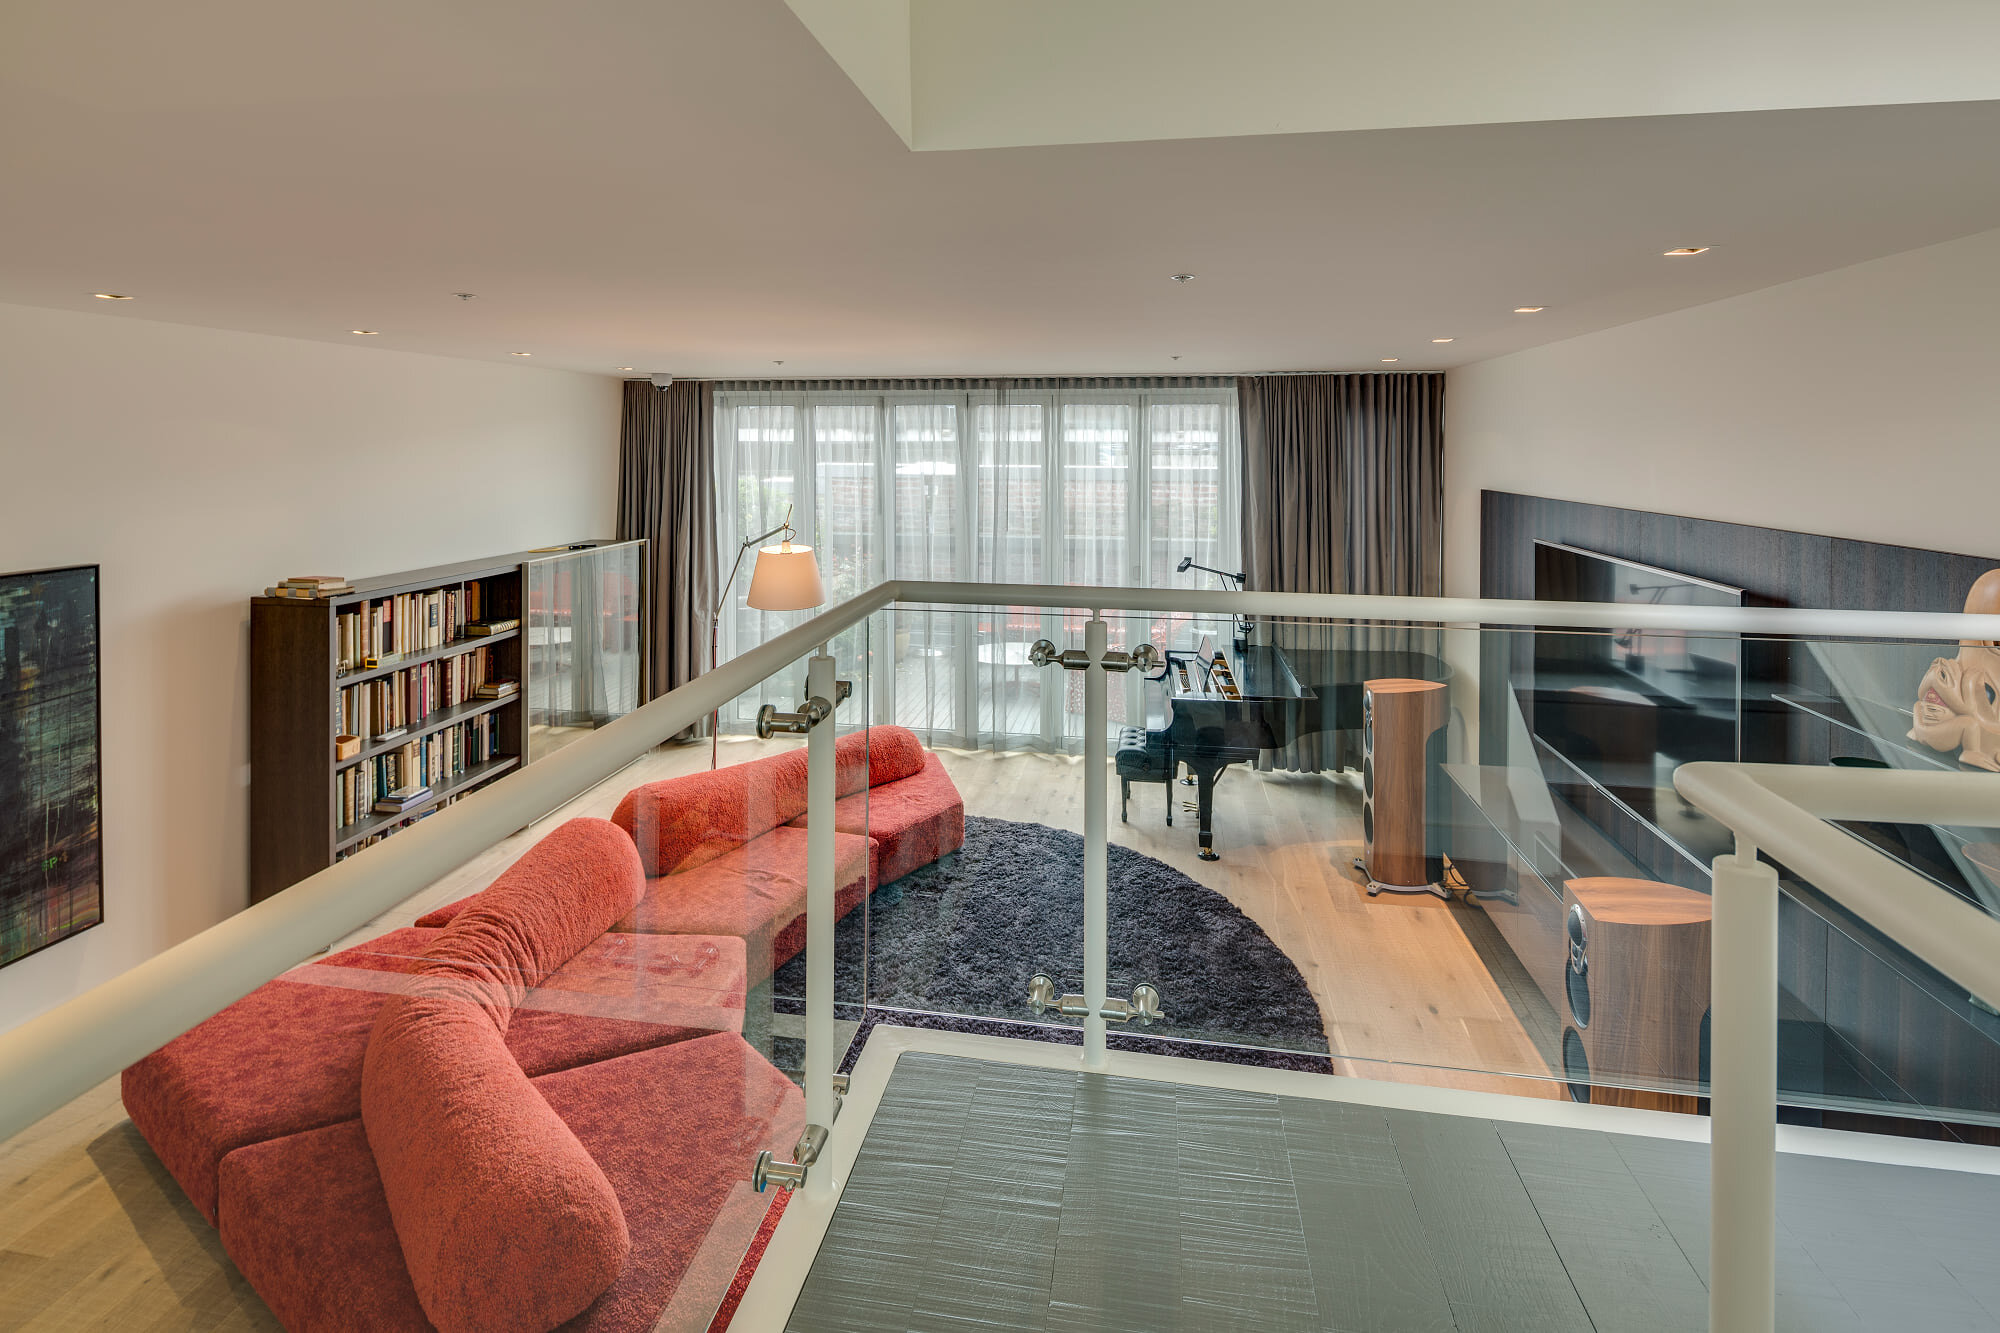 wsi-imageoptim-Modern-livingroom-apt-Vancouver.jpg